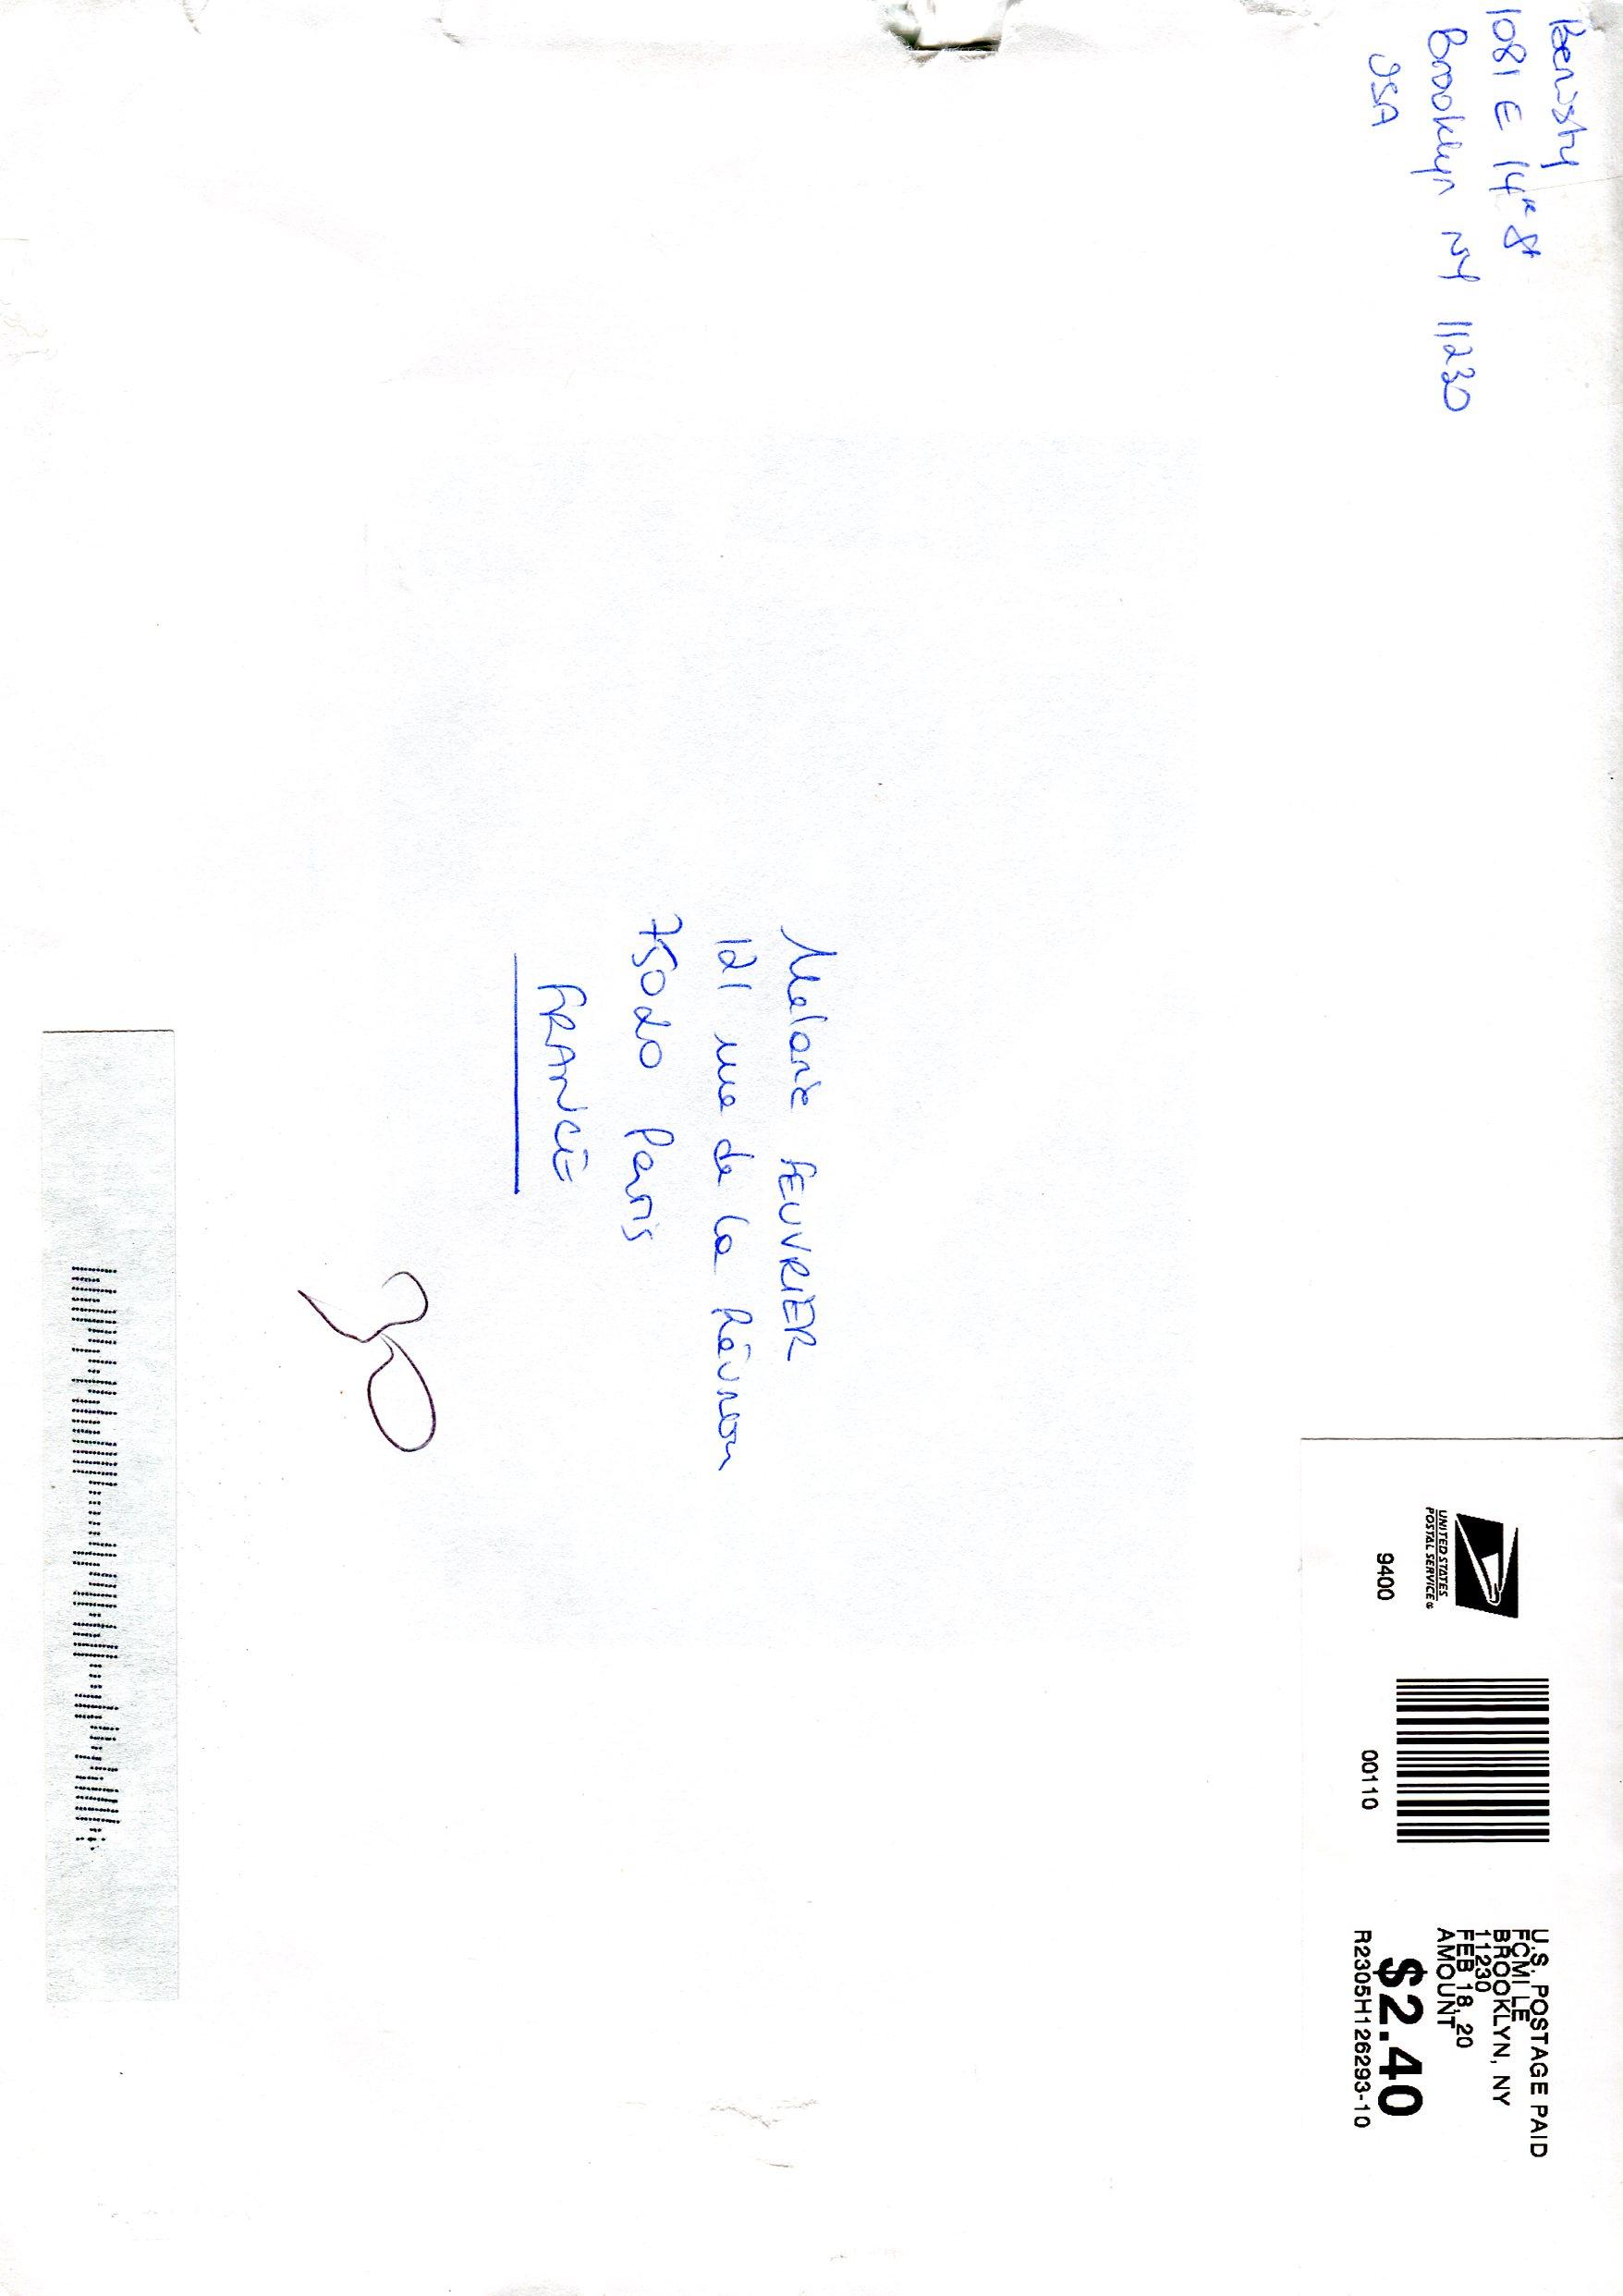 enveloppe011